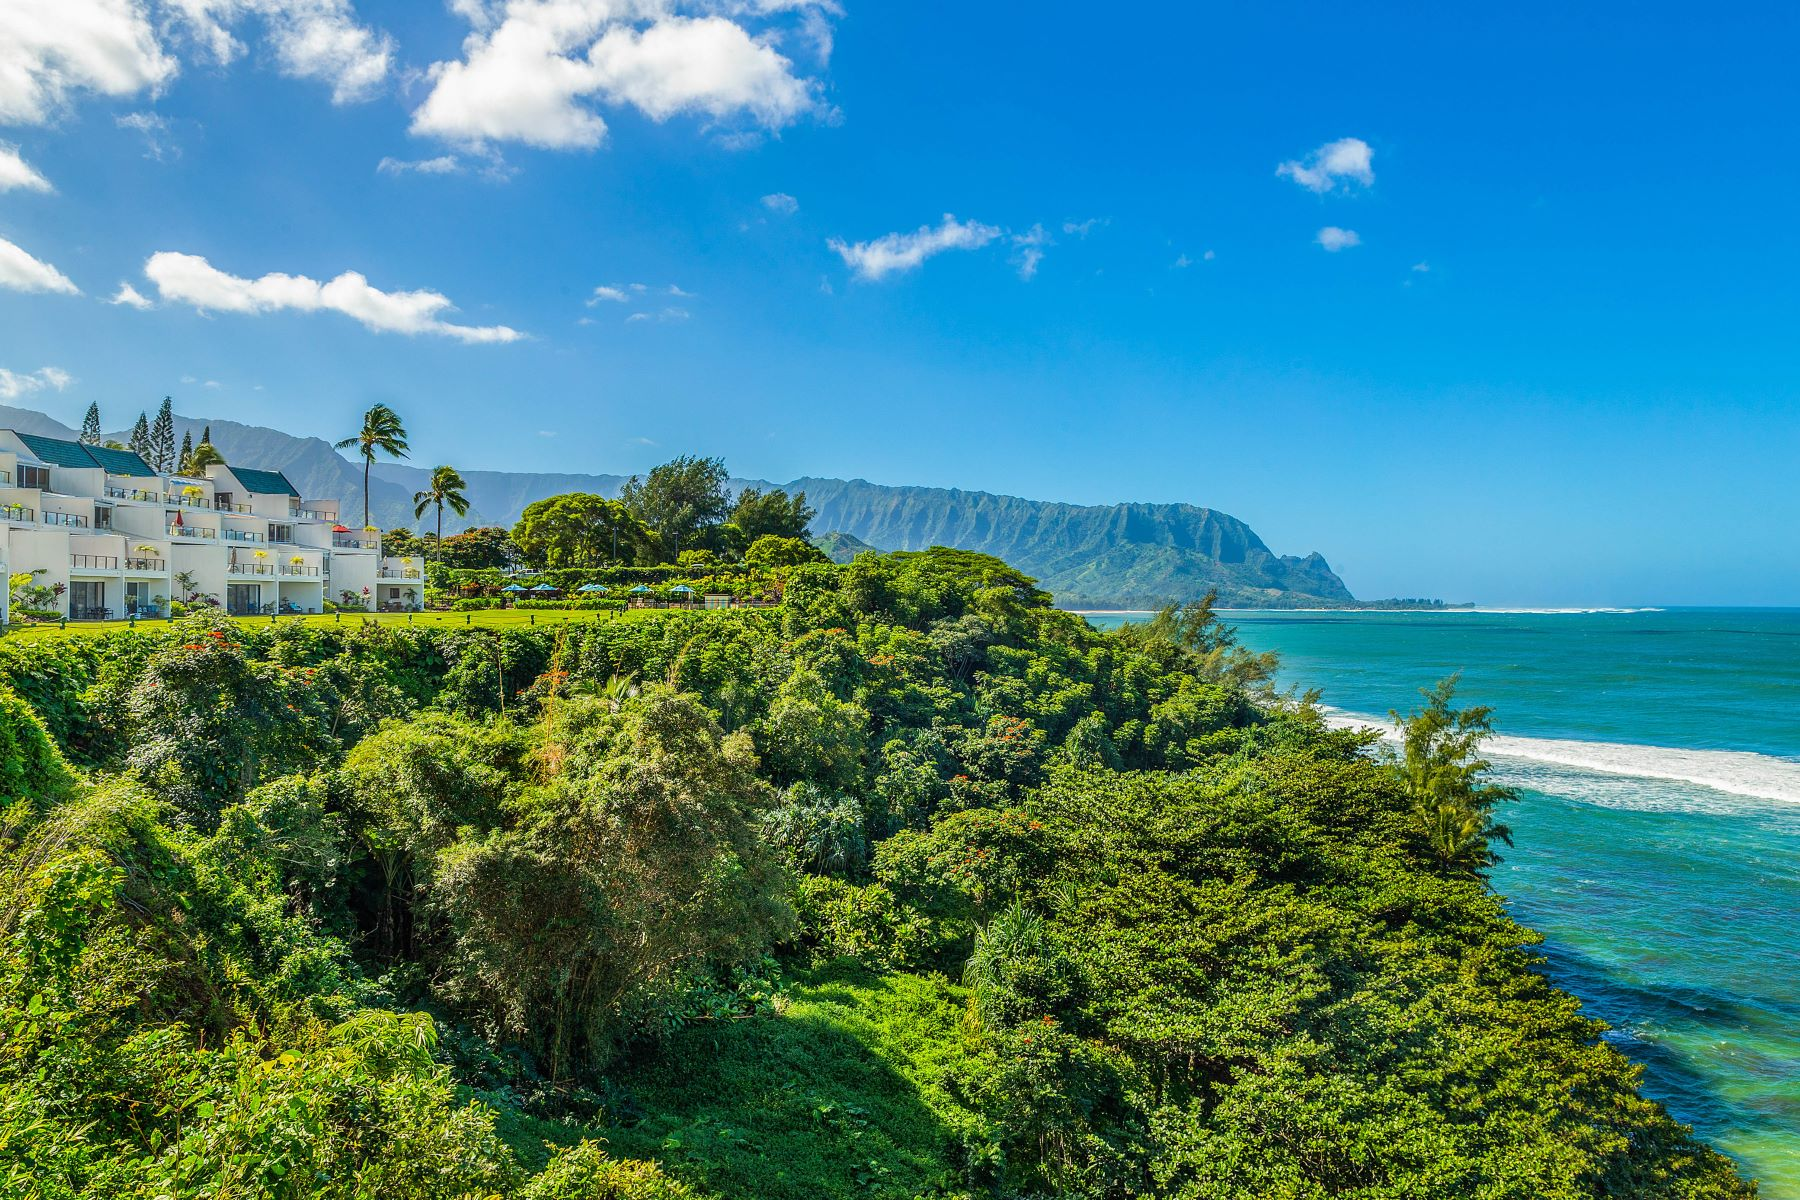 Condominiums 为 销售 在 5454 KA HAKU RD #401 PRINCEVILLE, HI 96722 5454 KA HAKU RD #401 普林斯维尔, 夏威夷 96722 美国